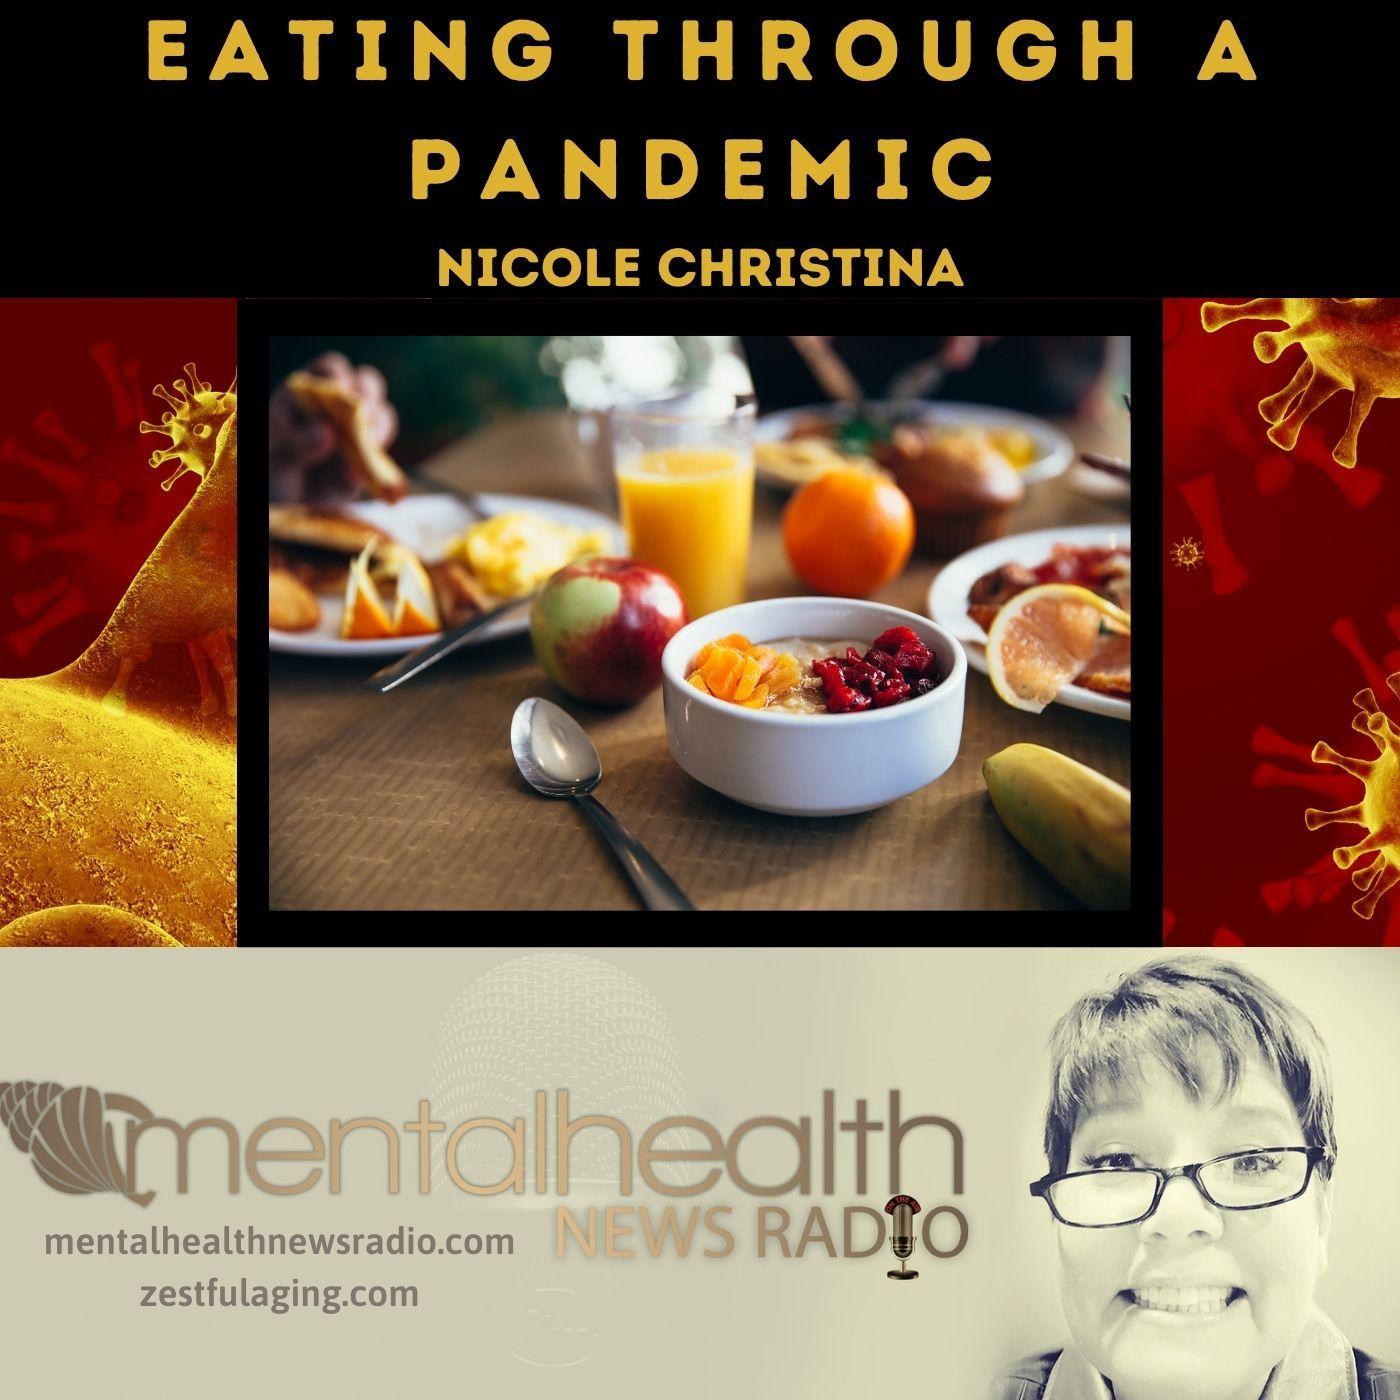 Mental Health News Radio - Eating Through a Pandemic with Nicole Christina